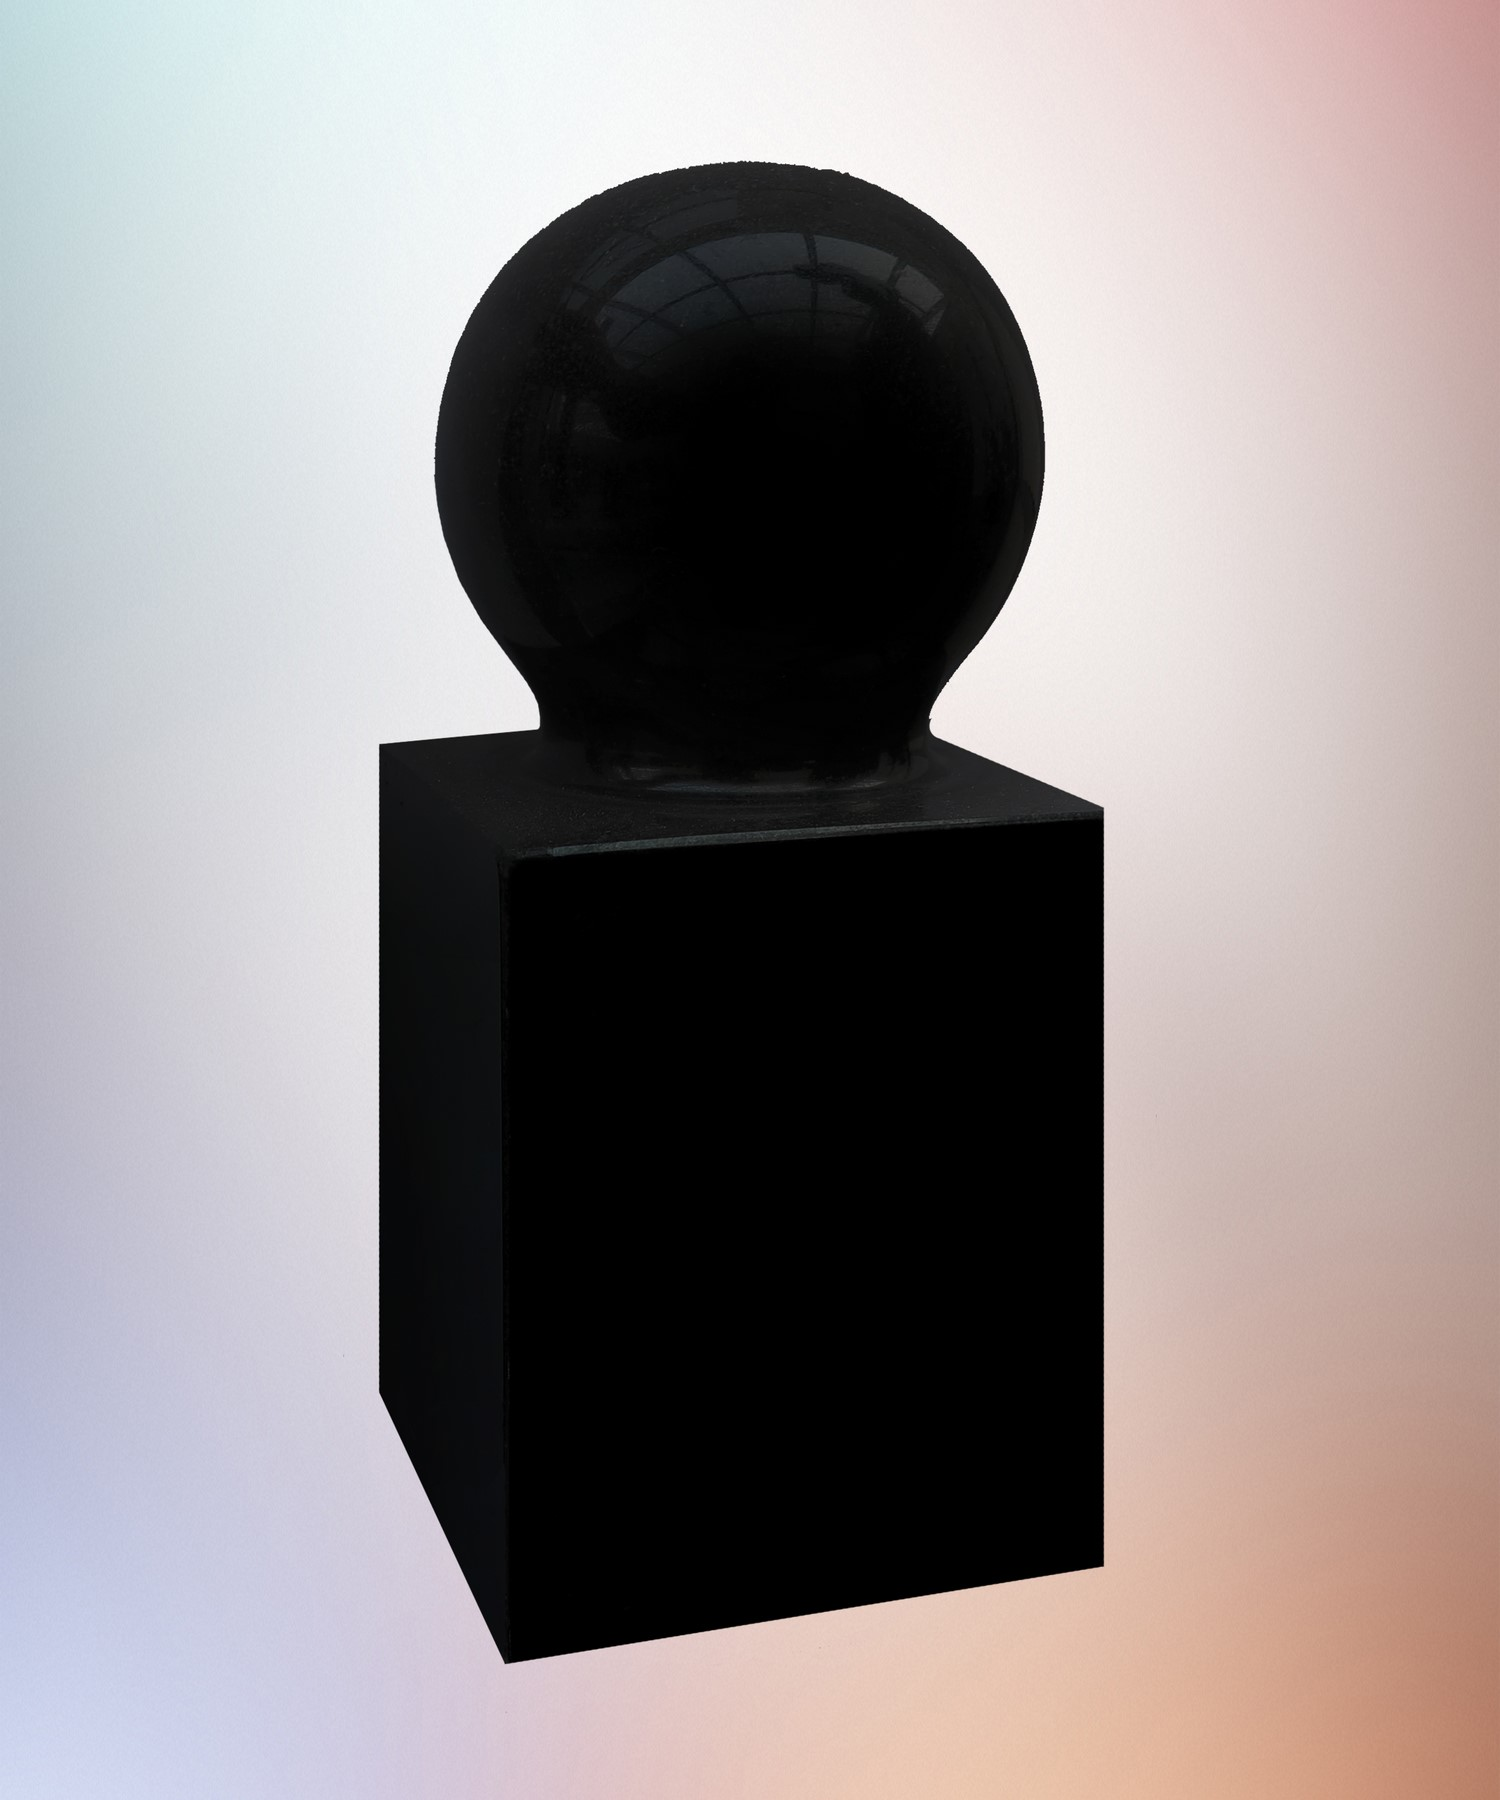 Кубик с шаром — С